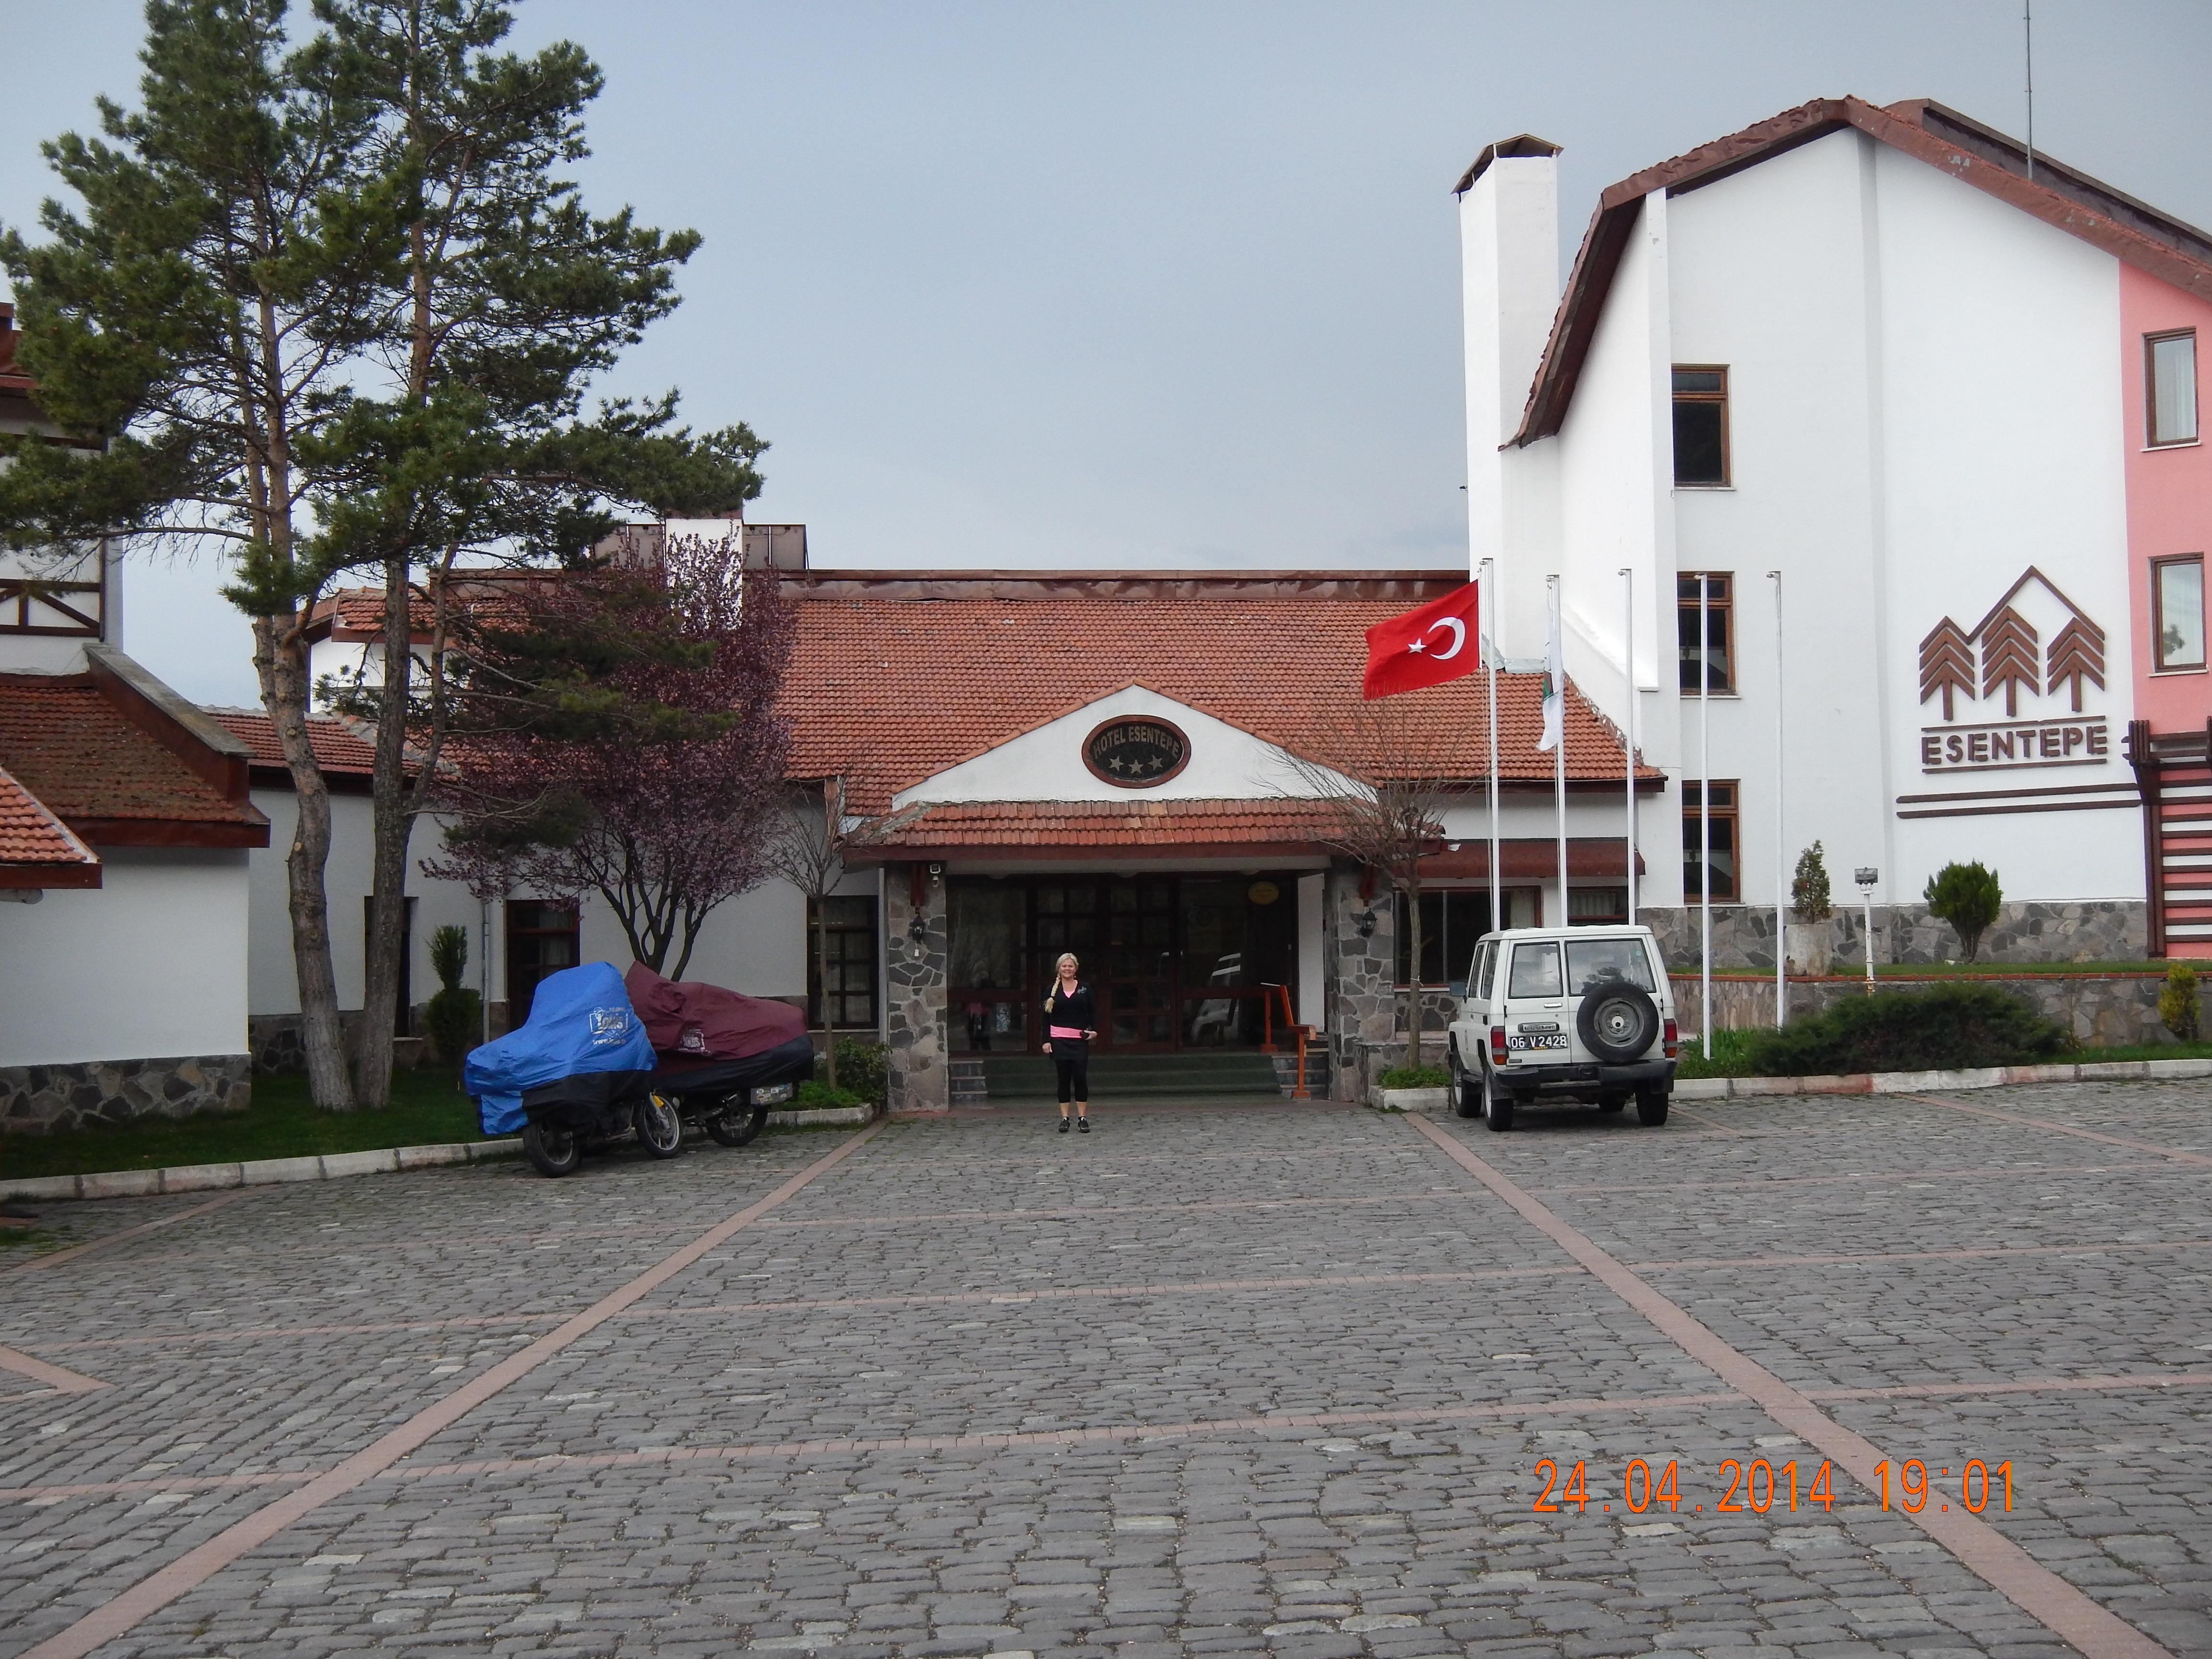 HOTEL ESETEPE